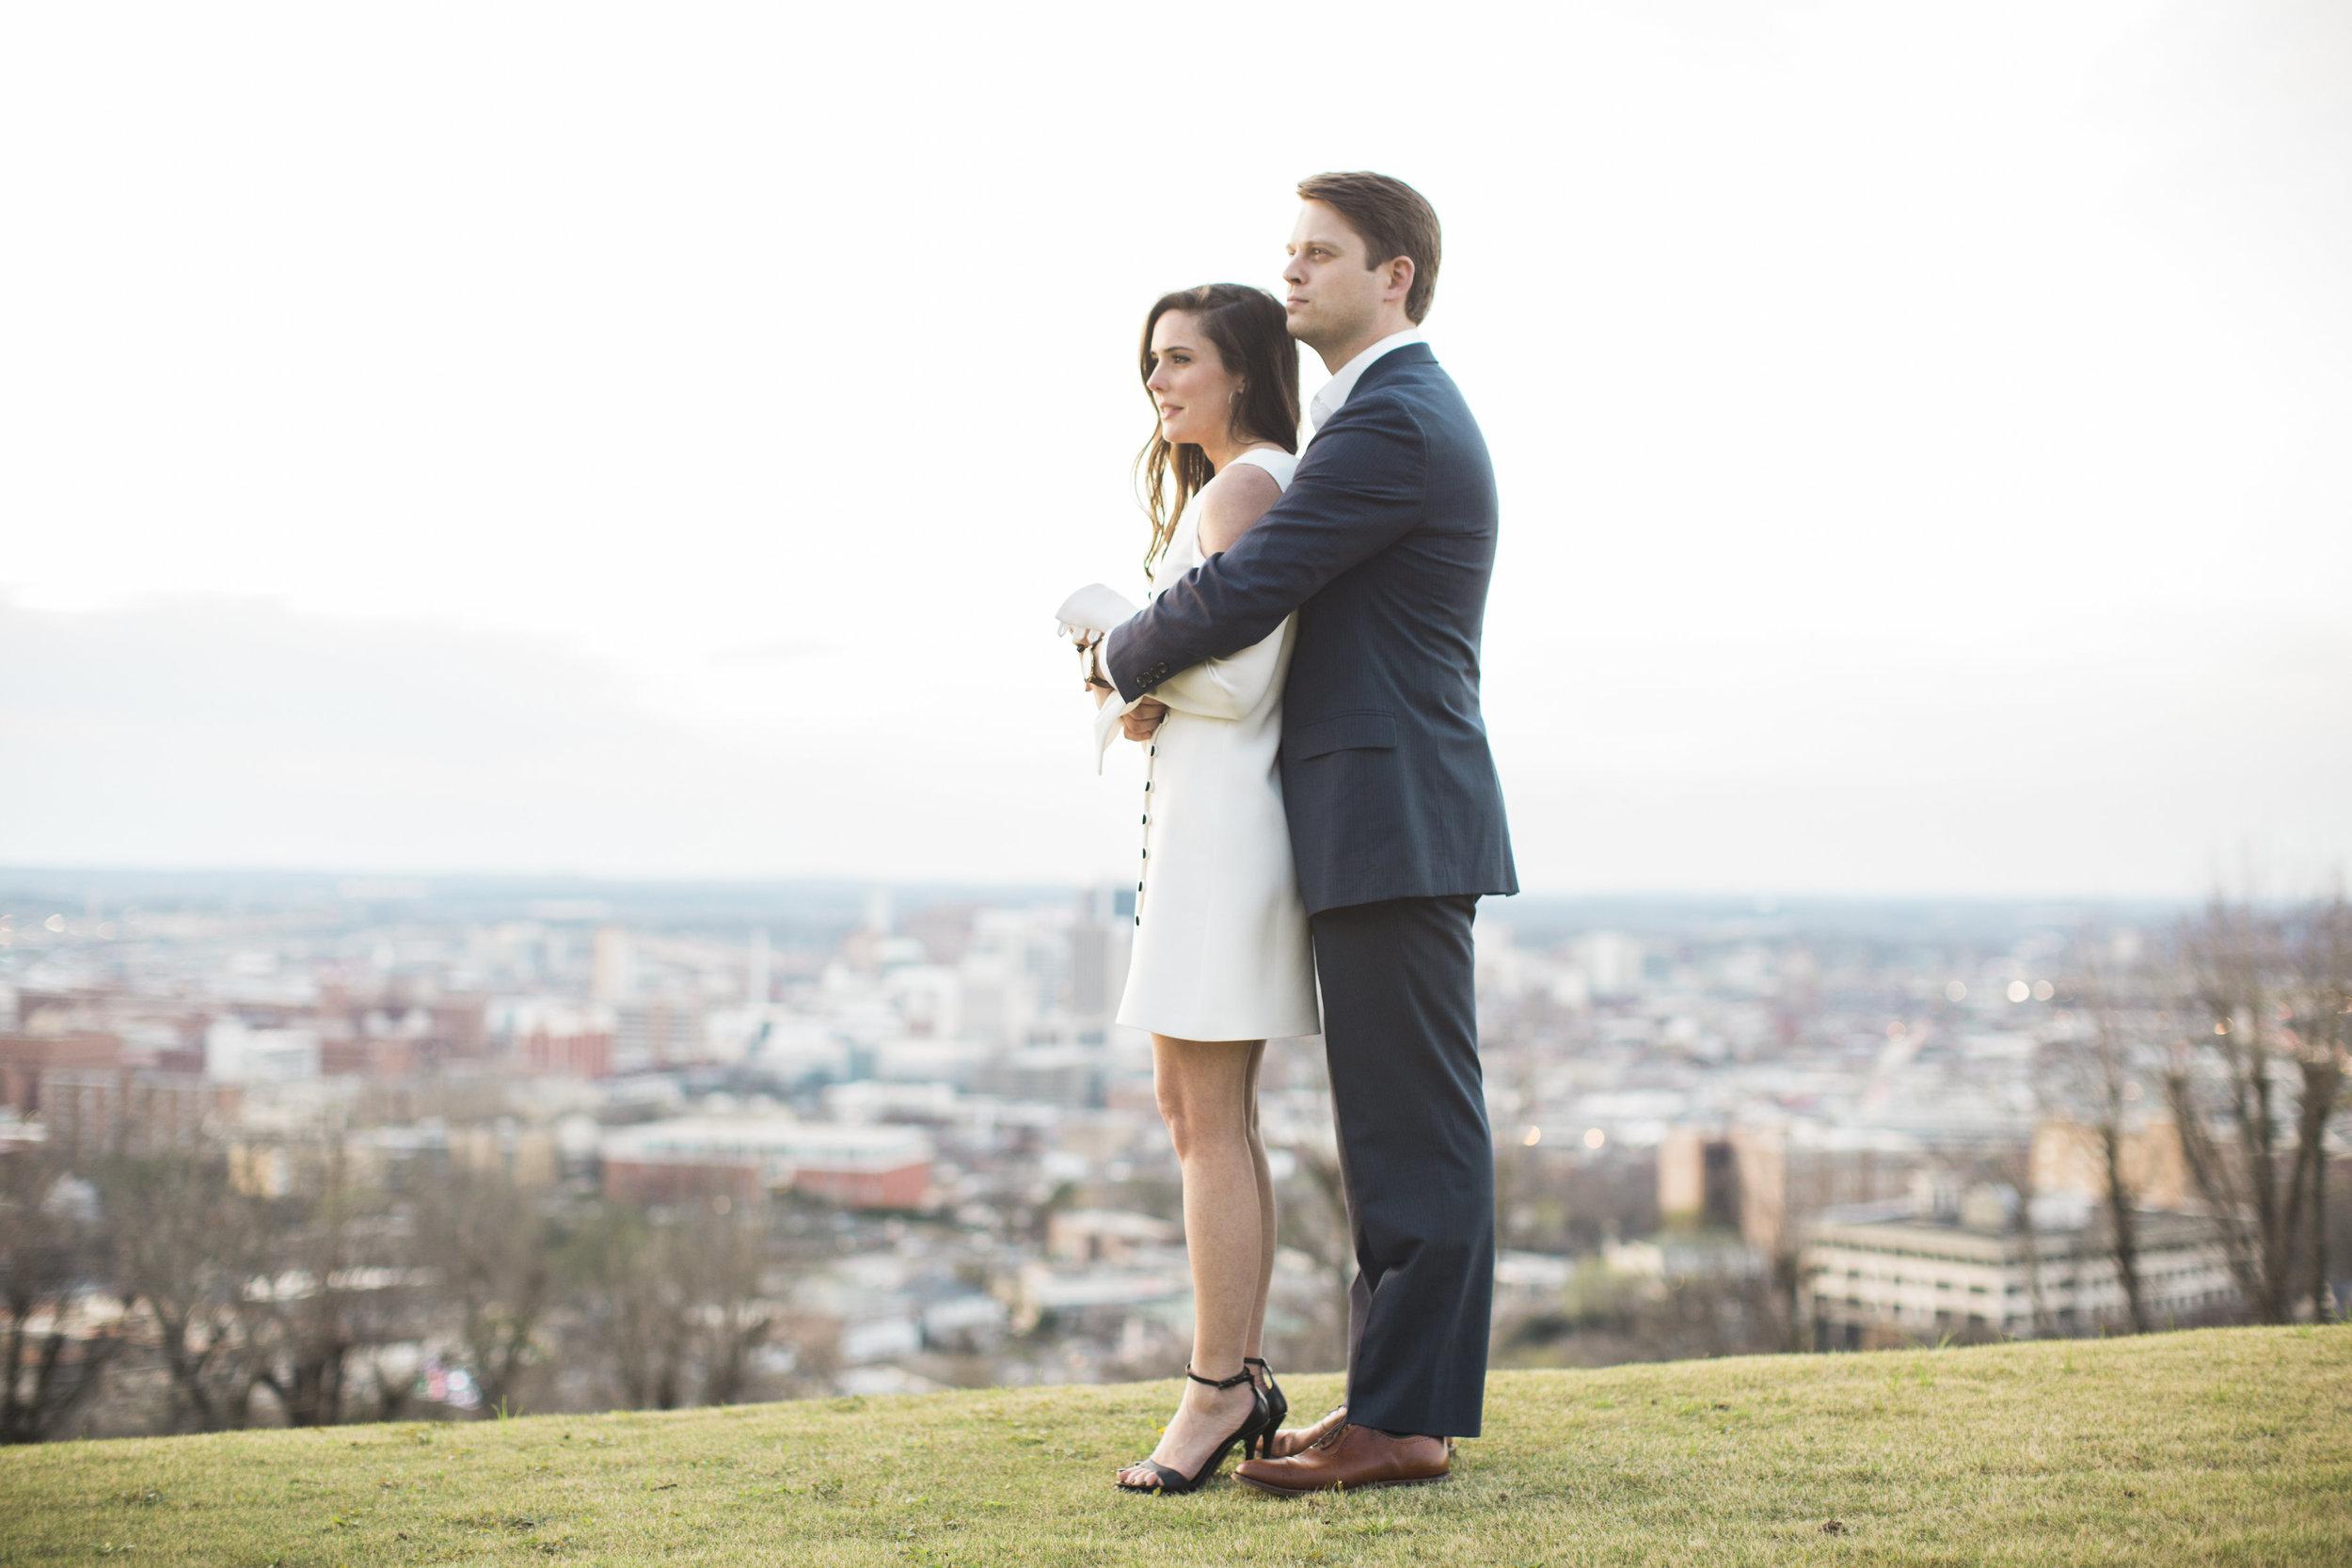 Handley Breaux Designs | Birmingham Wedding Planner | Southern wedding planner | Alabama Bride | Engagement Session | Leslie Hollingsworth Photography